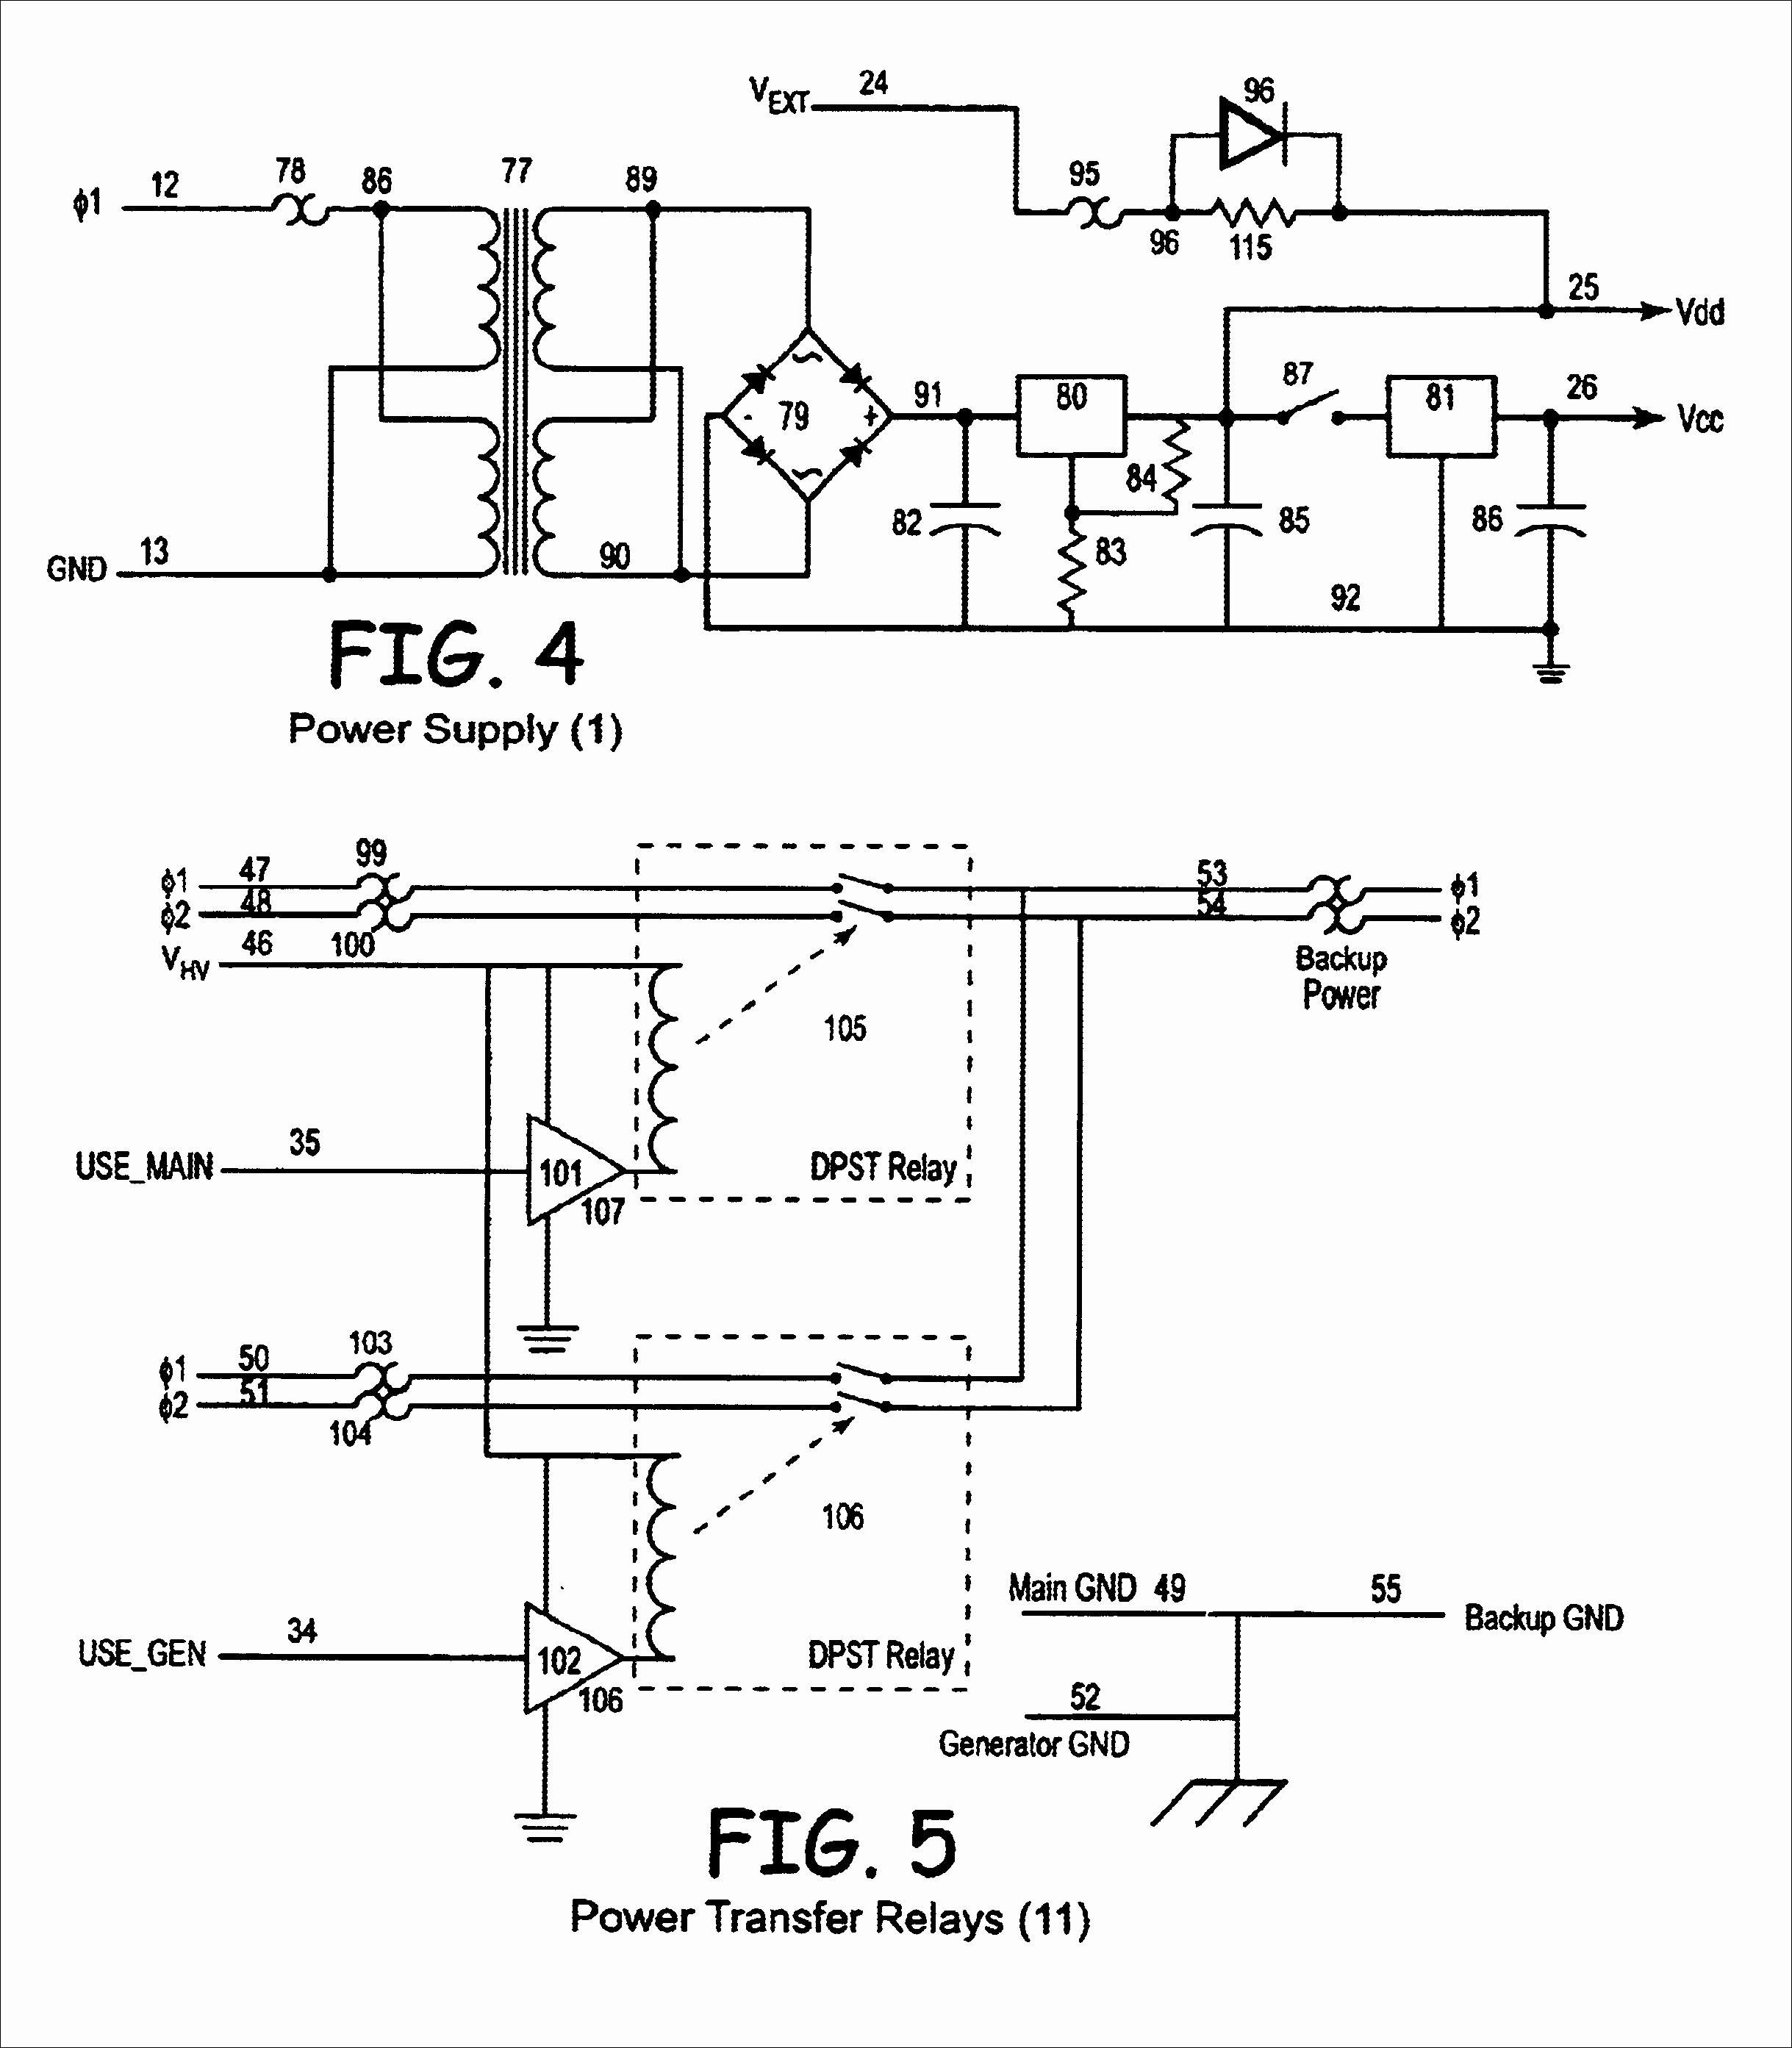 100w Hps Ballast Kit Wiring Diagram Wiring Diagram For 1000w Hps Ballast Wiring Diagram